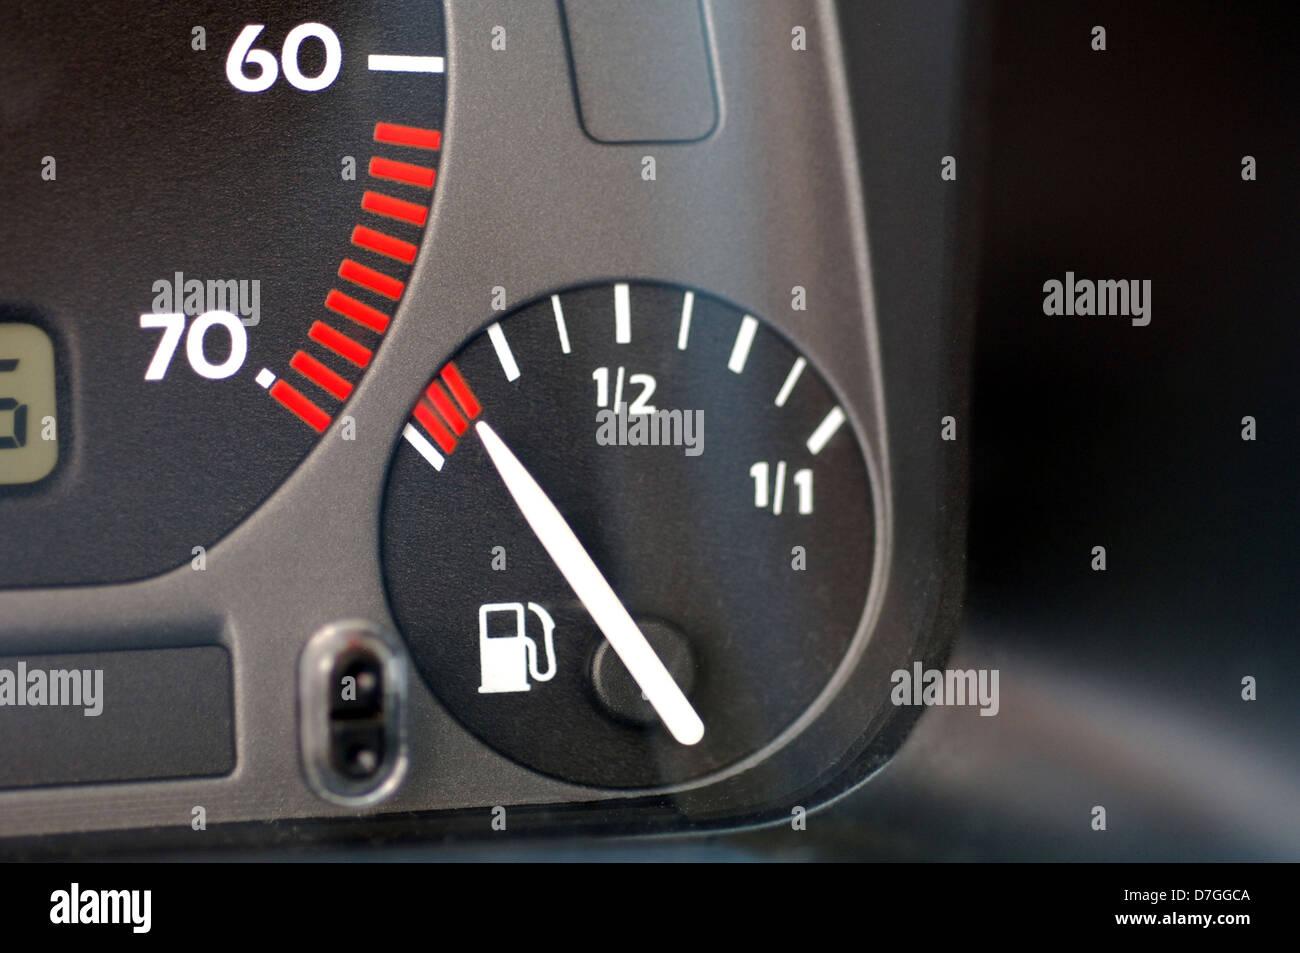 Car, instruments, announcement, speedometer, petrol gauge, gasoline level - Stock Image